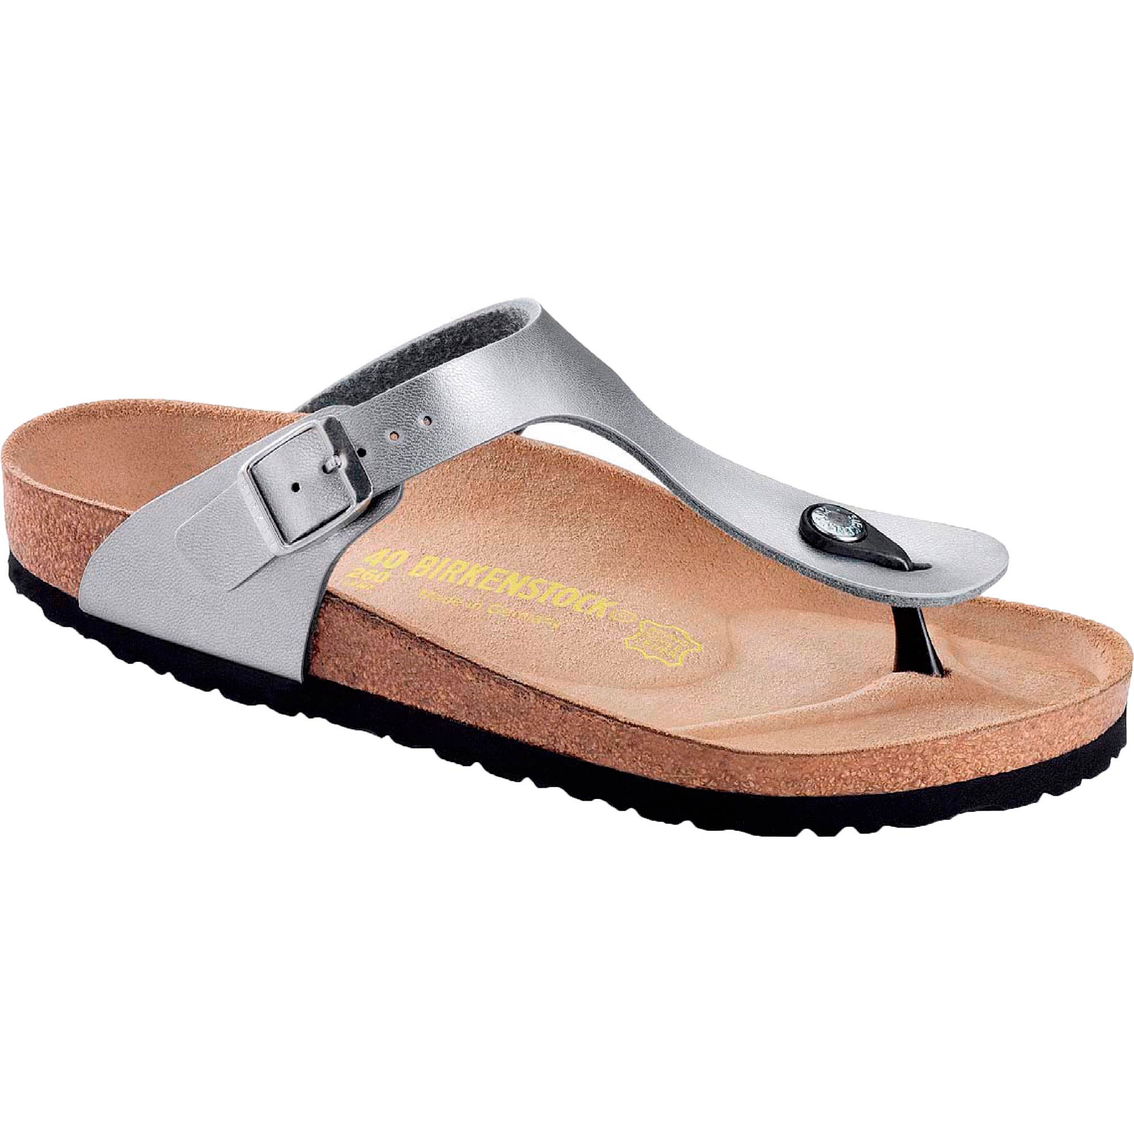 c55dc2d5099849 Birkenstock Women s Gizeh Sandals